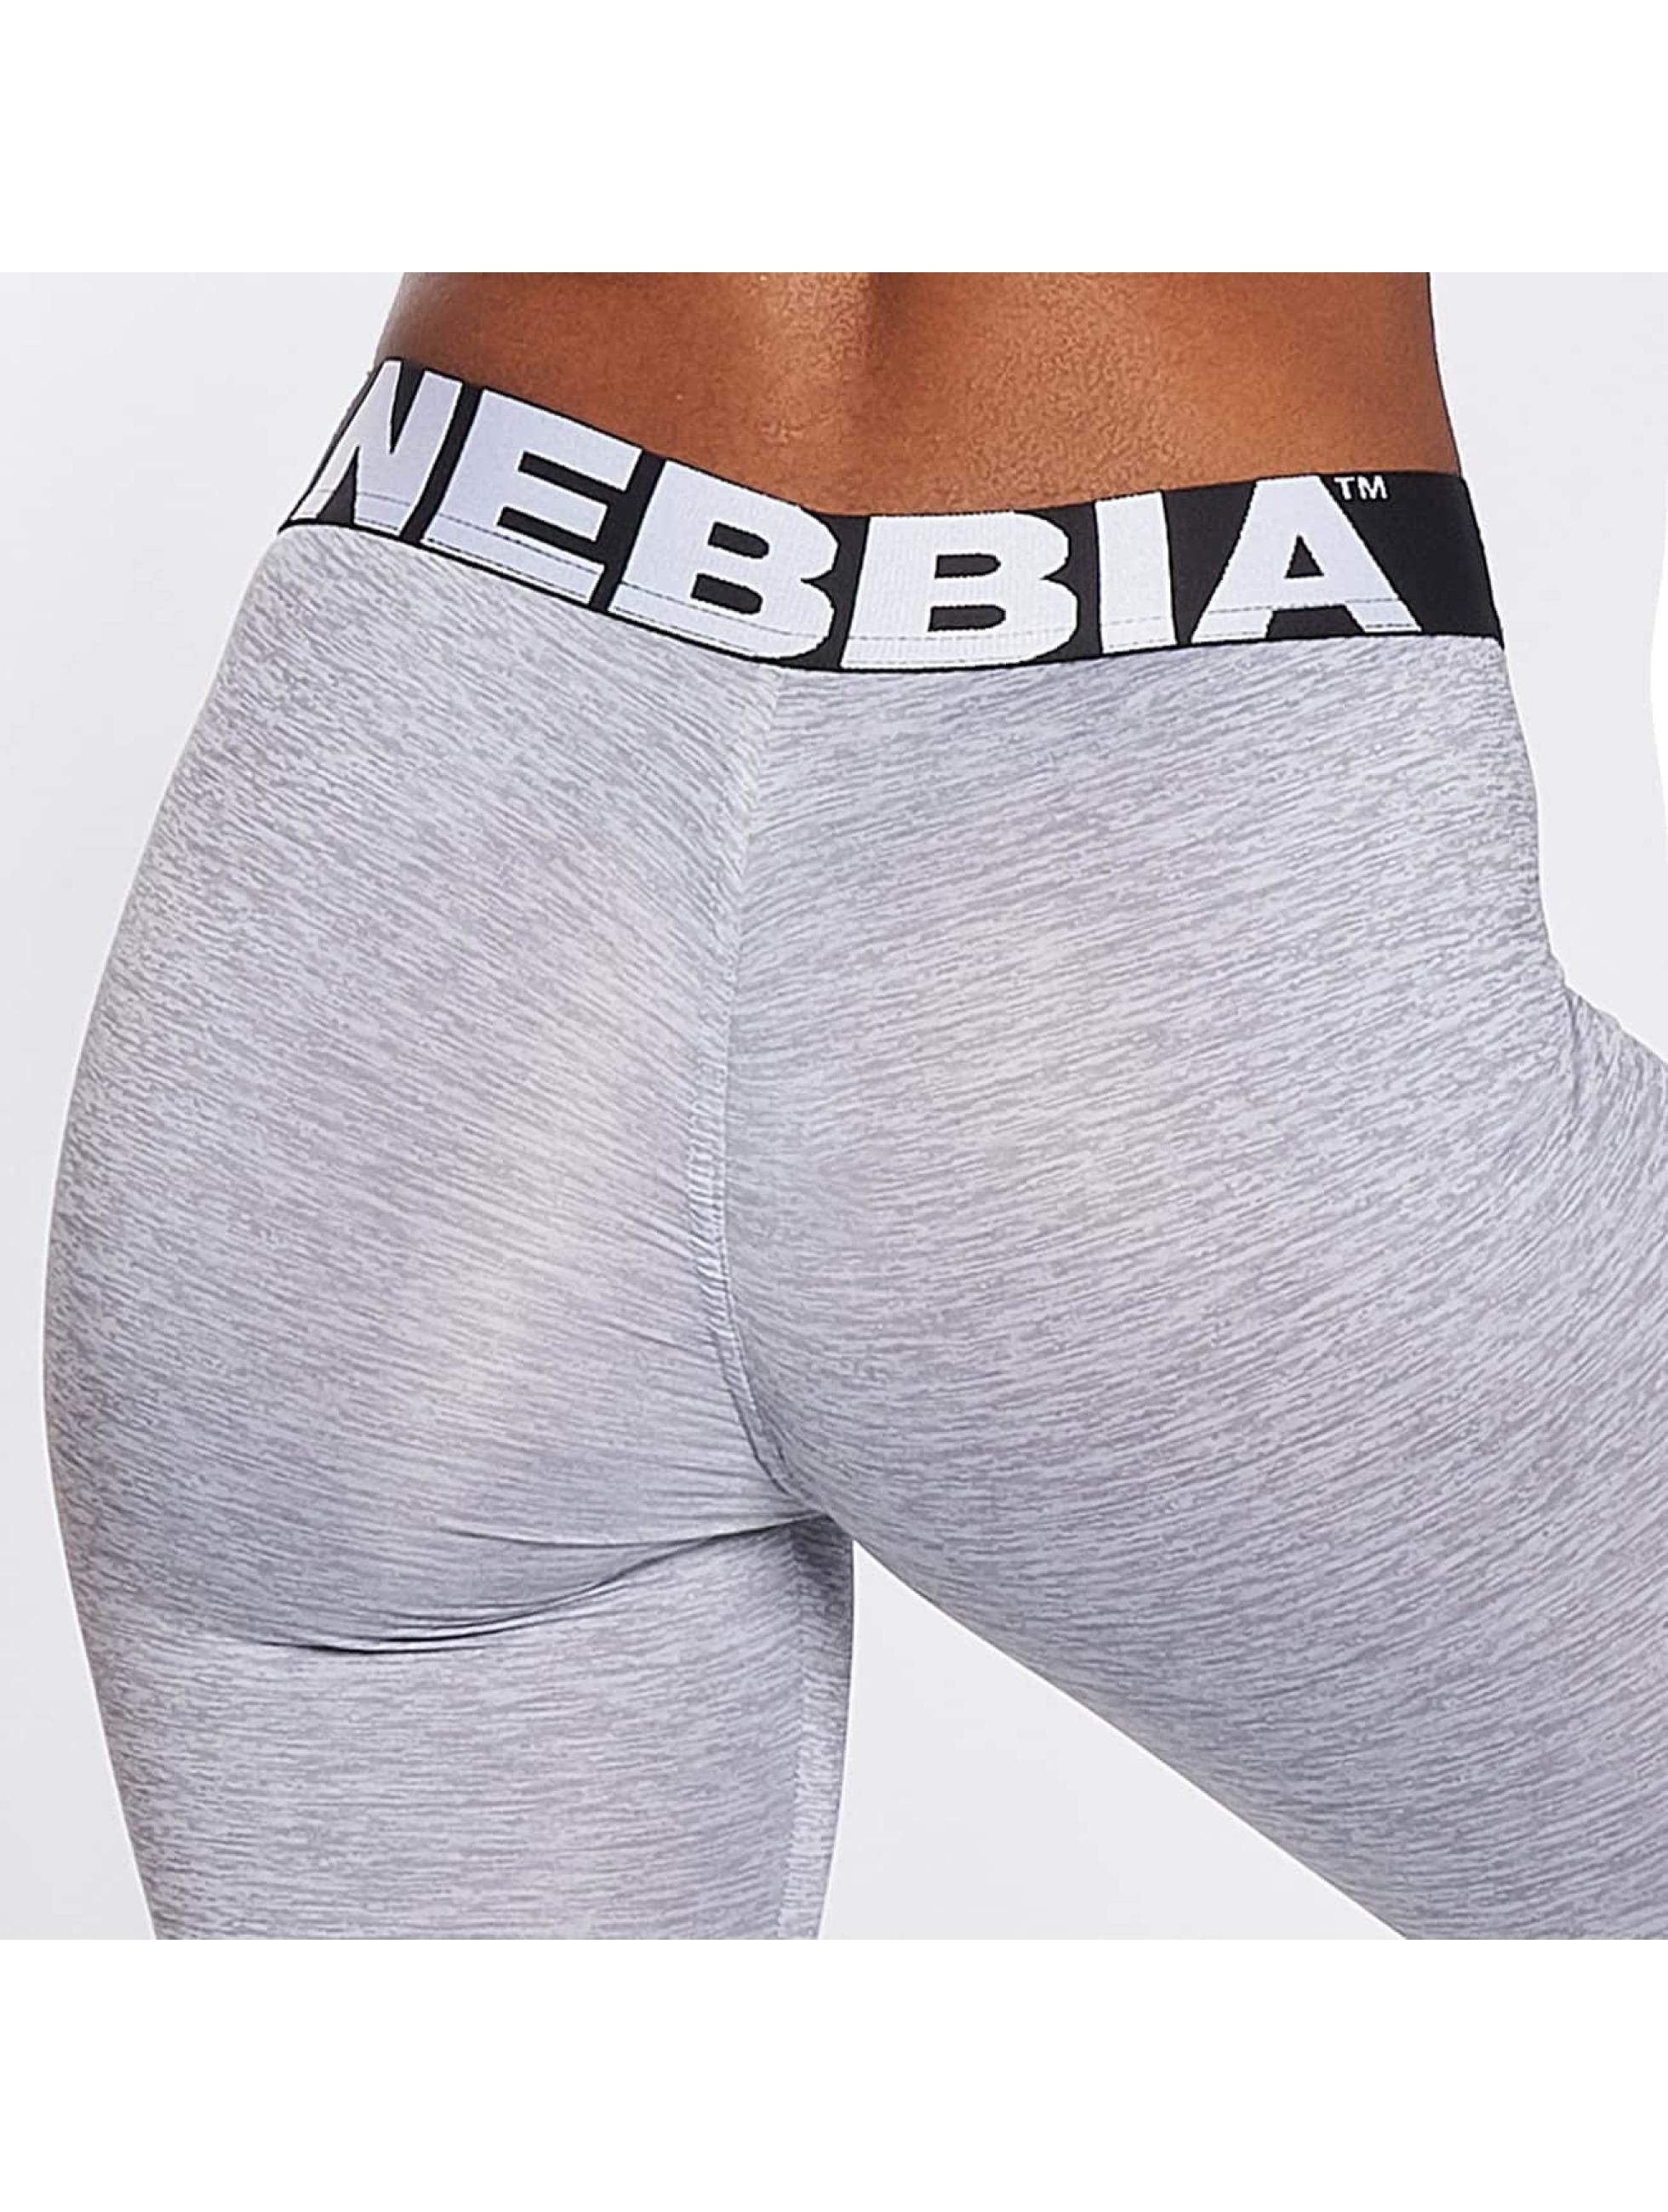 Nebbia Leginy/Tregginy Basic šedá